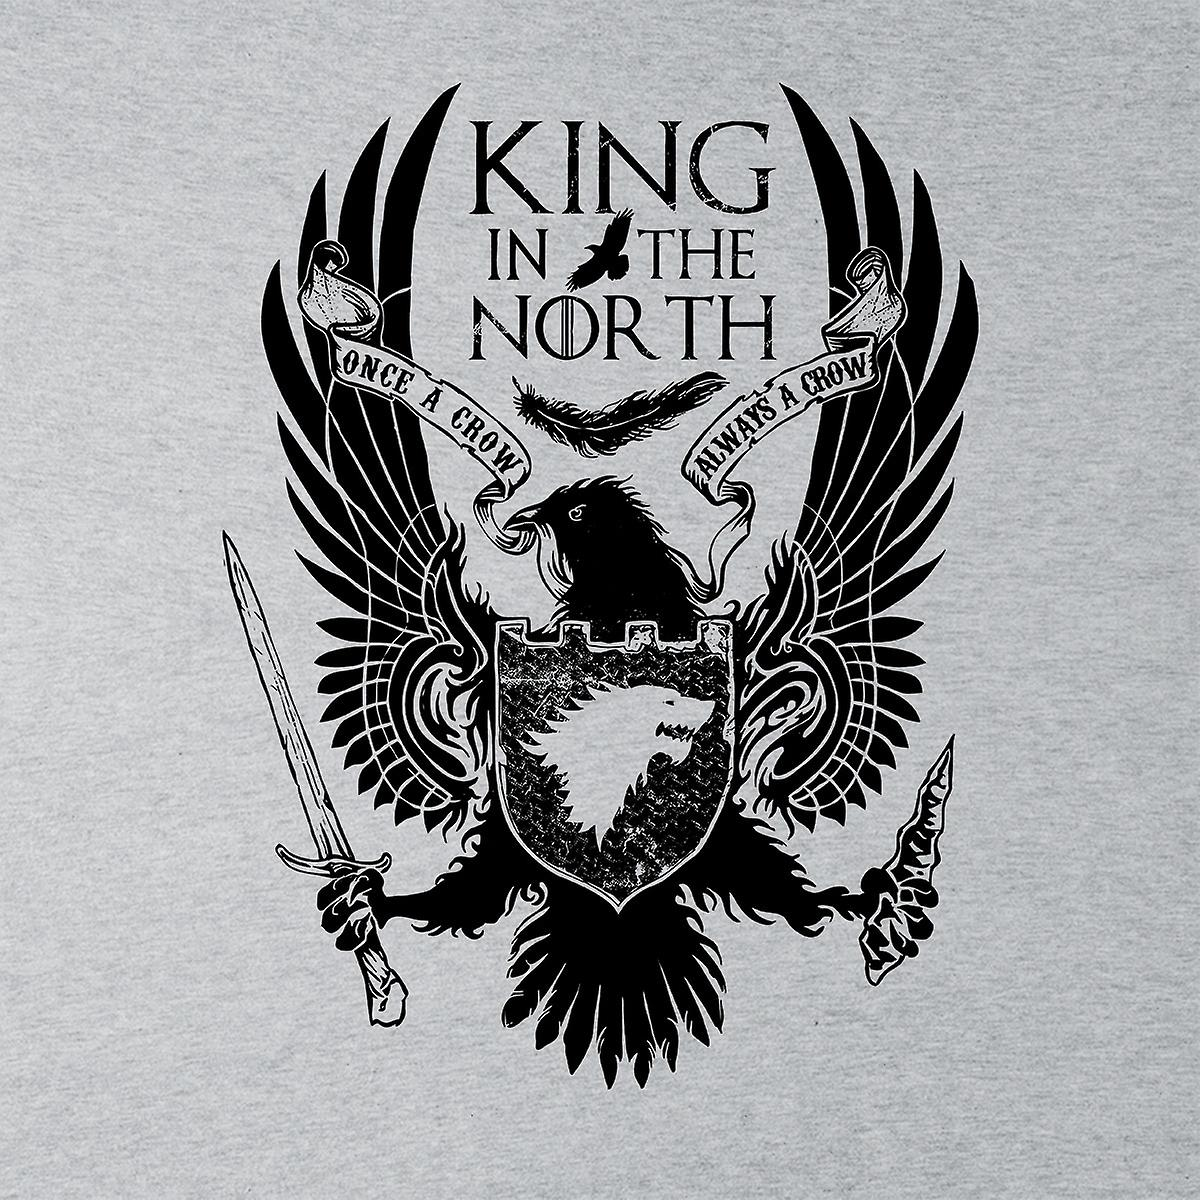 game of thrones könig